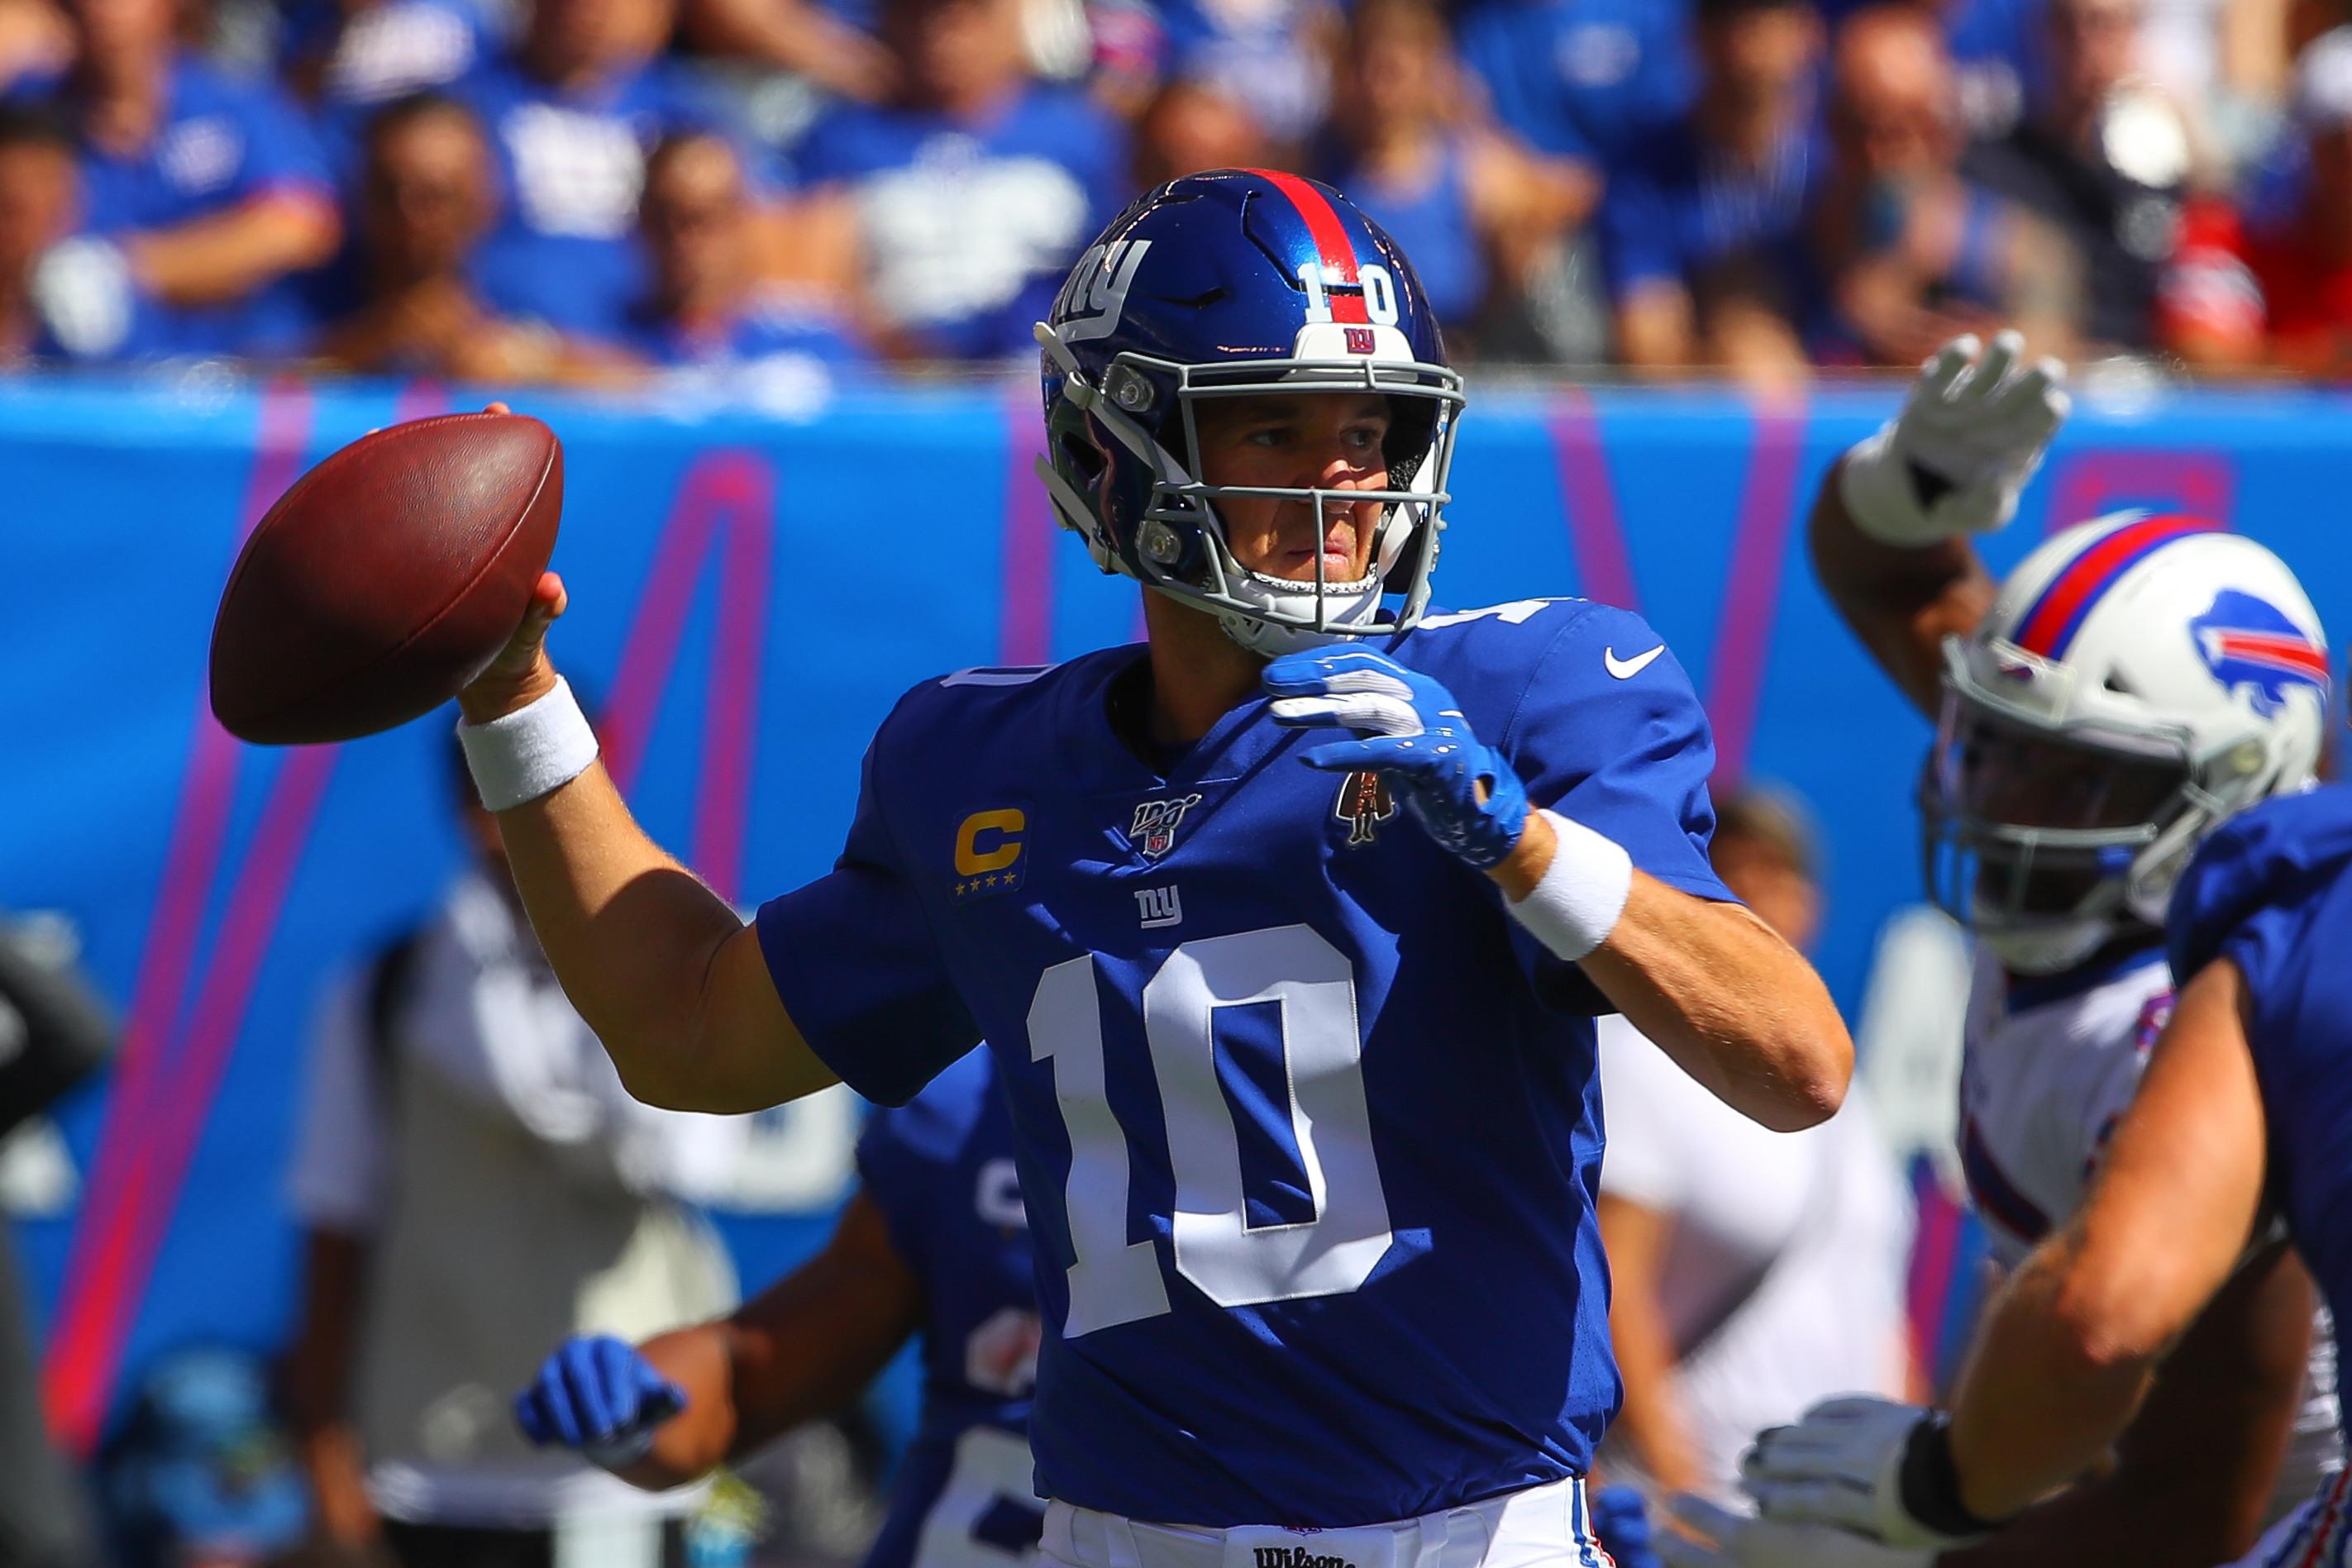 NFL: SEP 15 Bills at Giants